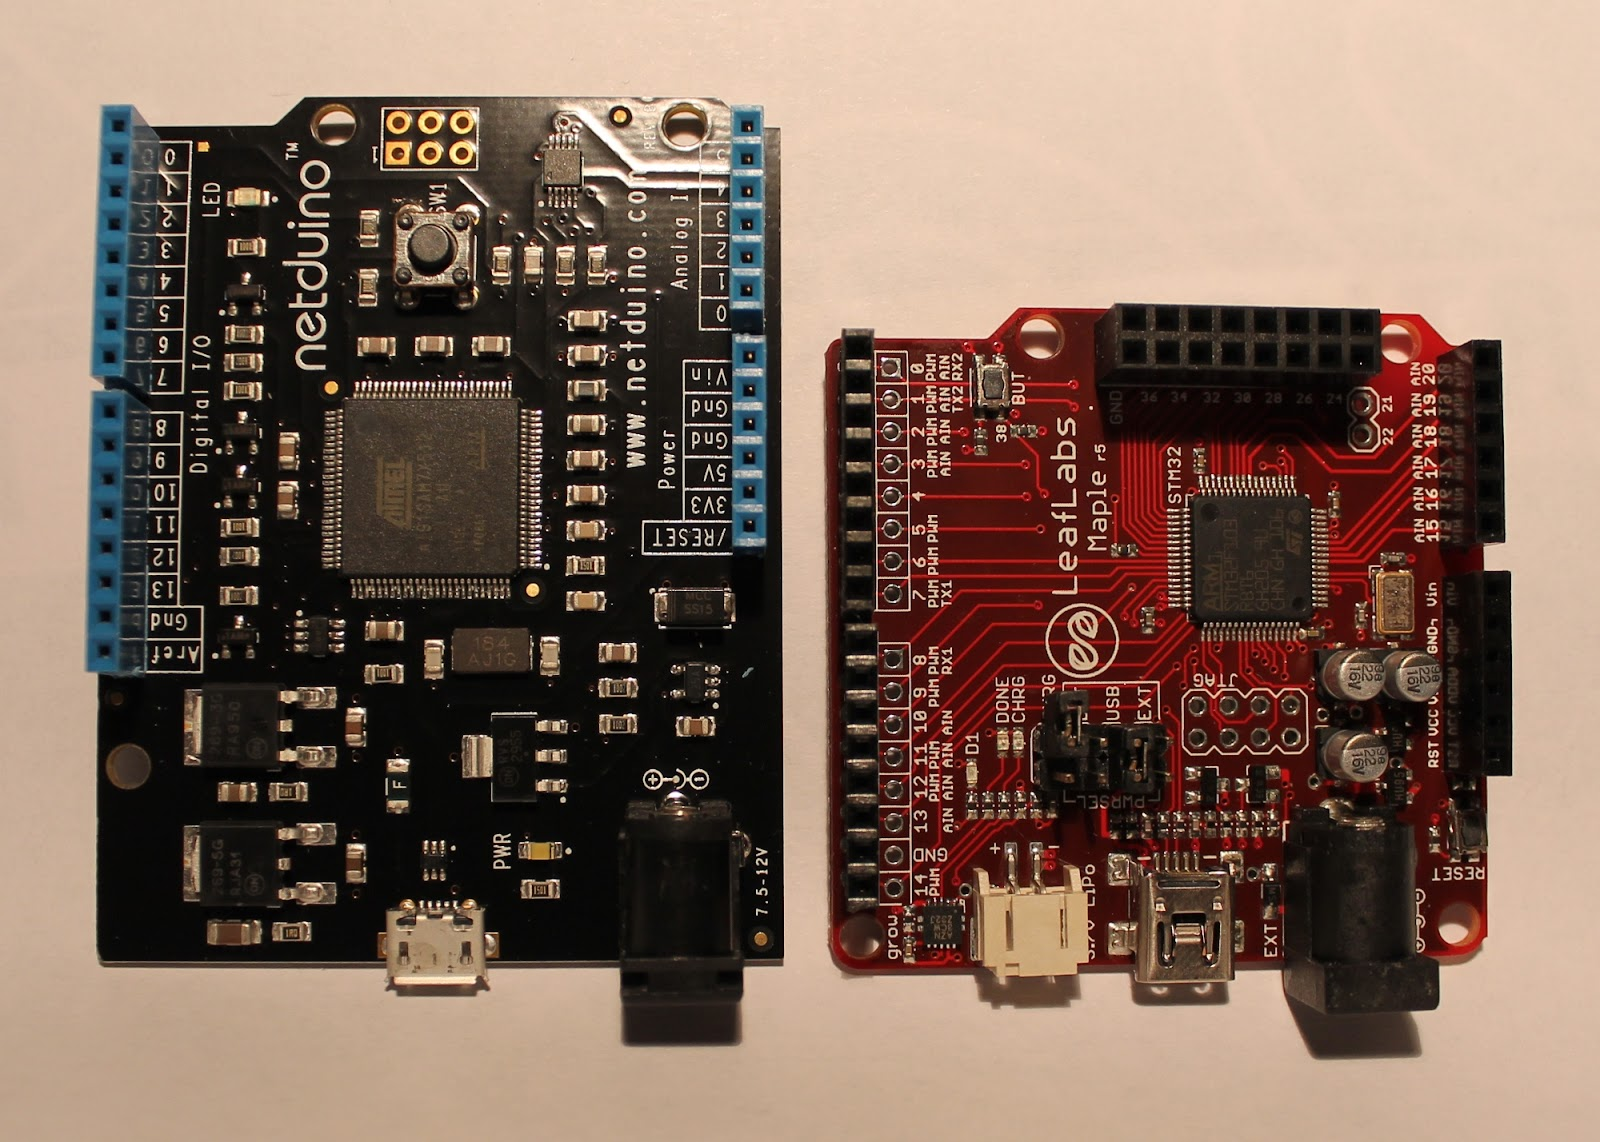 How to use Arduino Mega 2560 as Arduino isp - 3